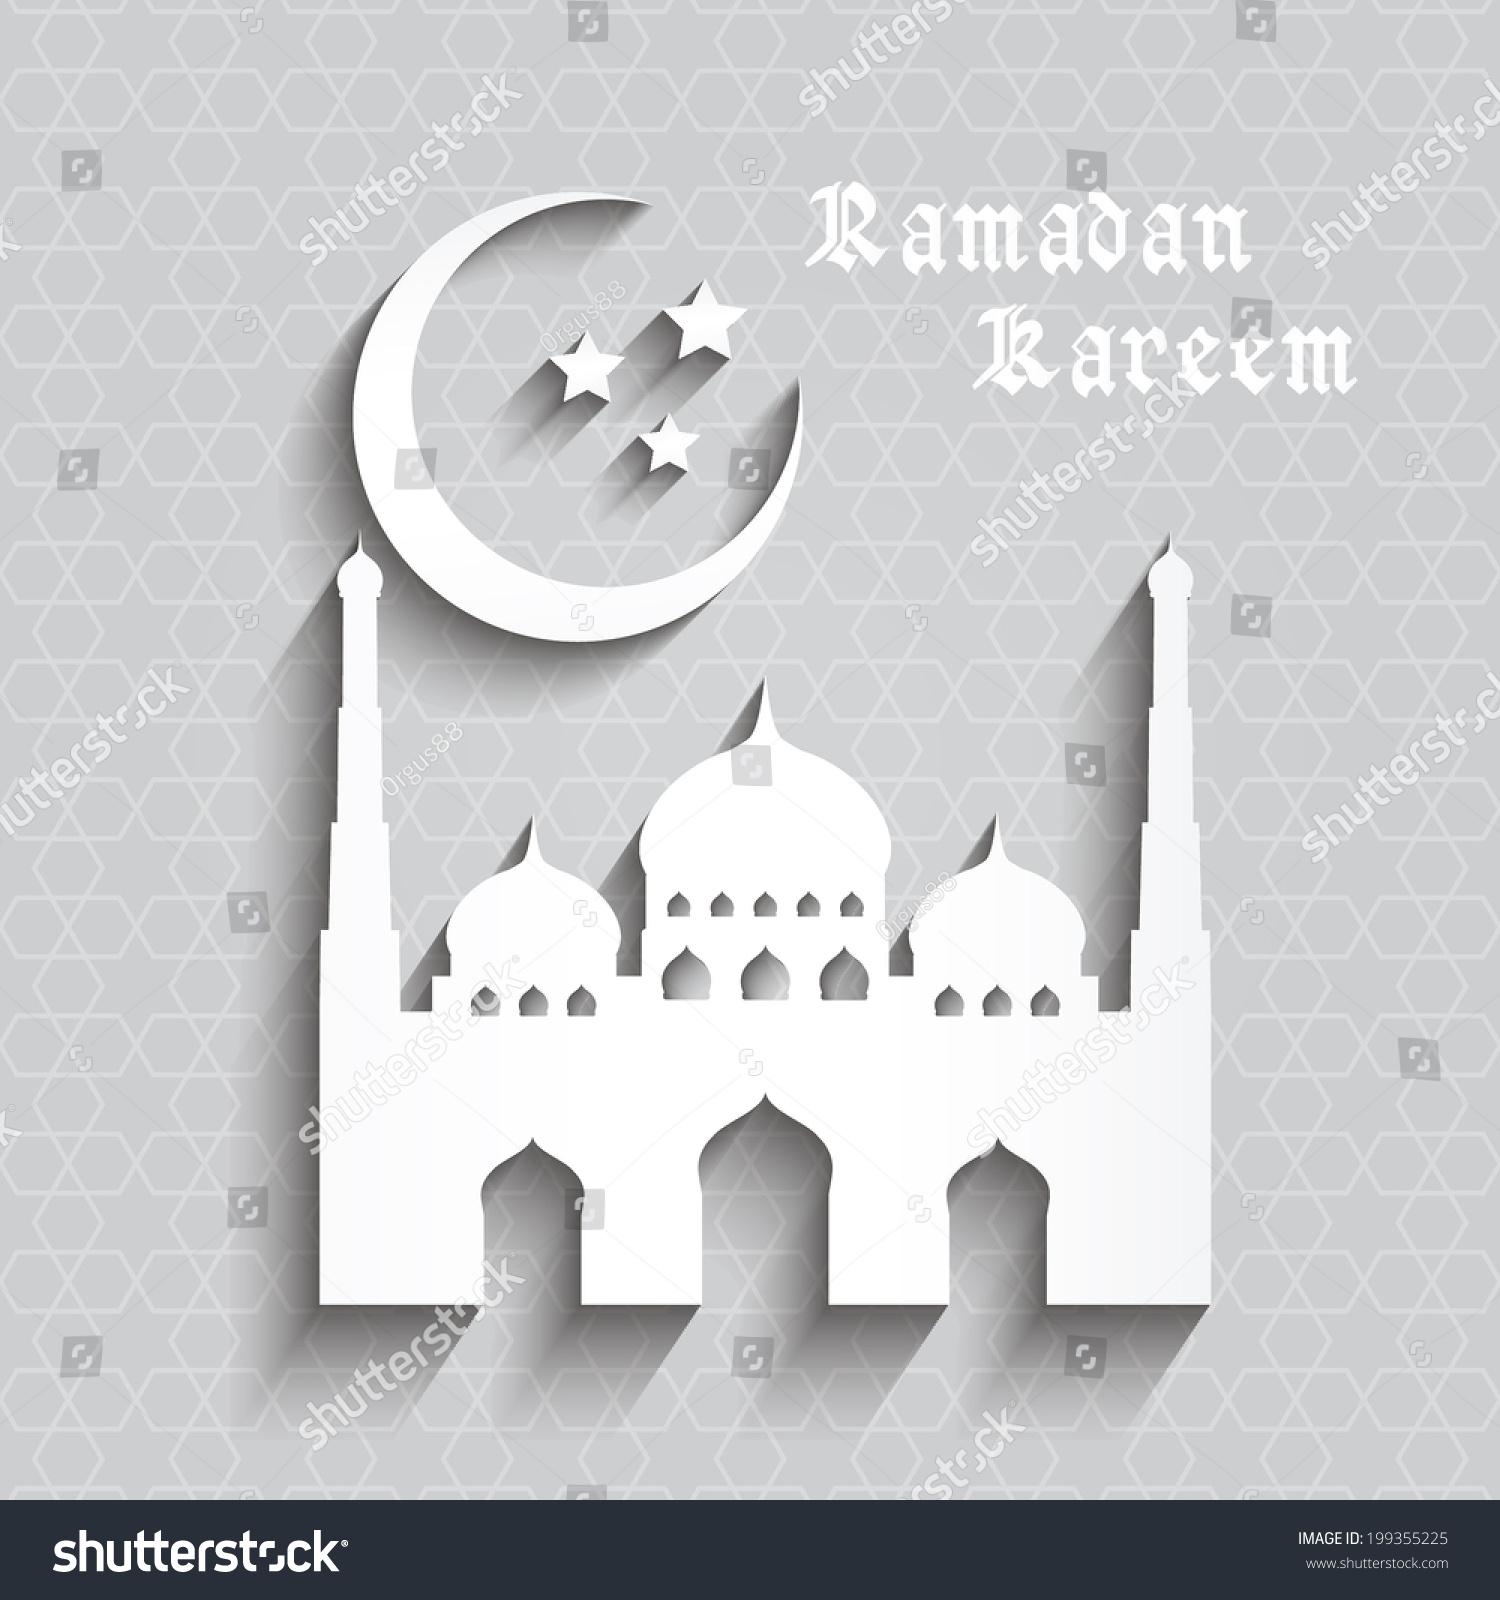 Ramazan kareem greeting card mosque crescent stock vector 199355225 ramazan kareem greeting card mosque and crescent moon with stars ramazan kareem on islamic pattern kristyandbryce Image collections